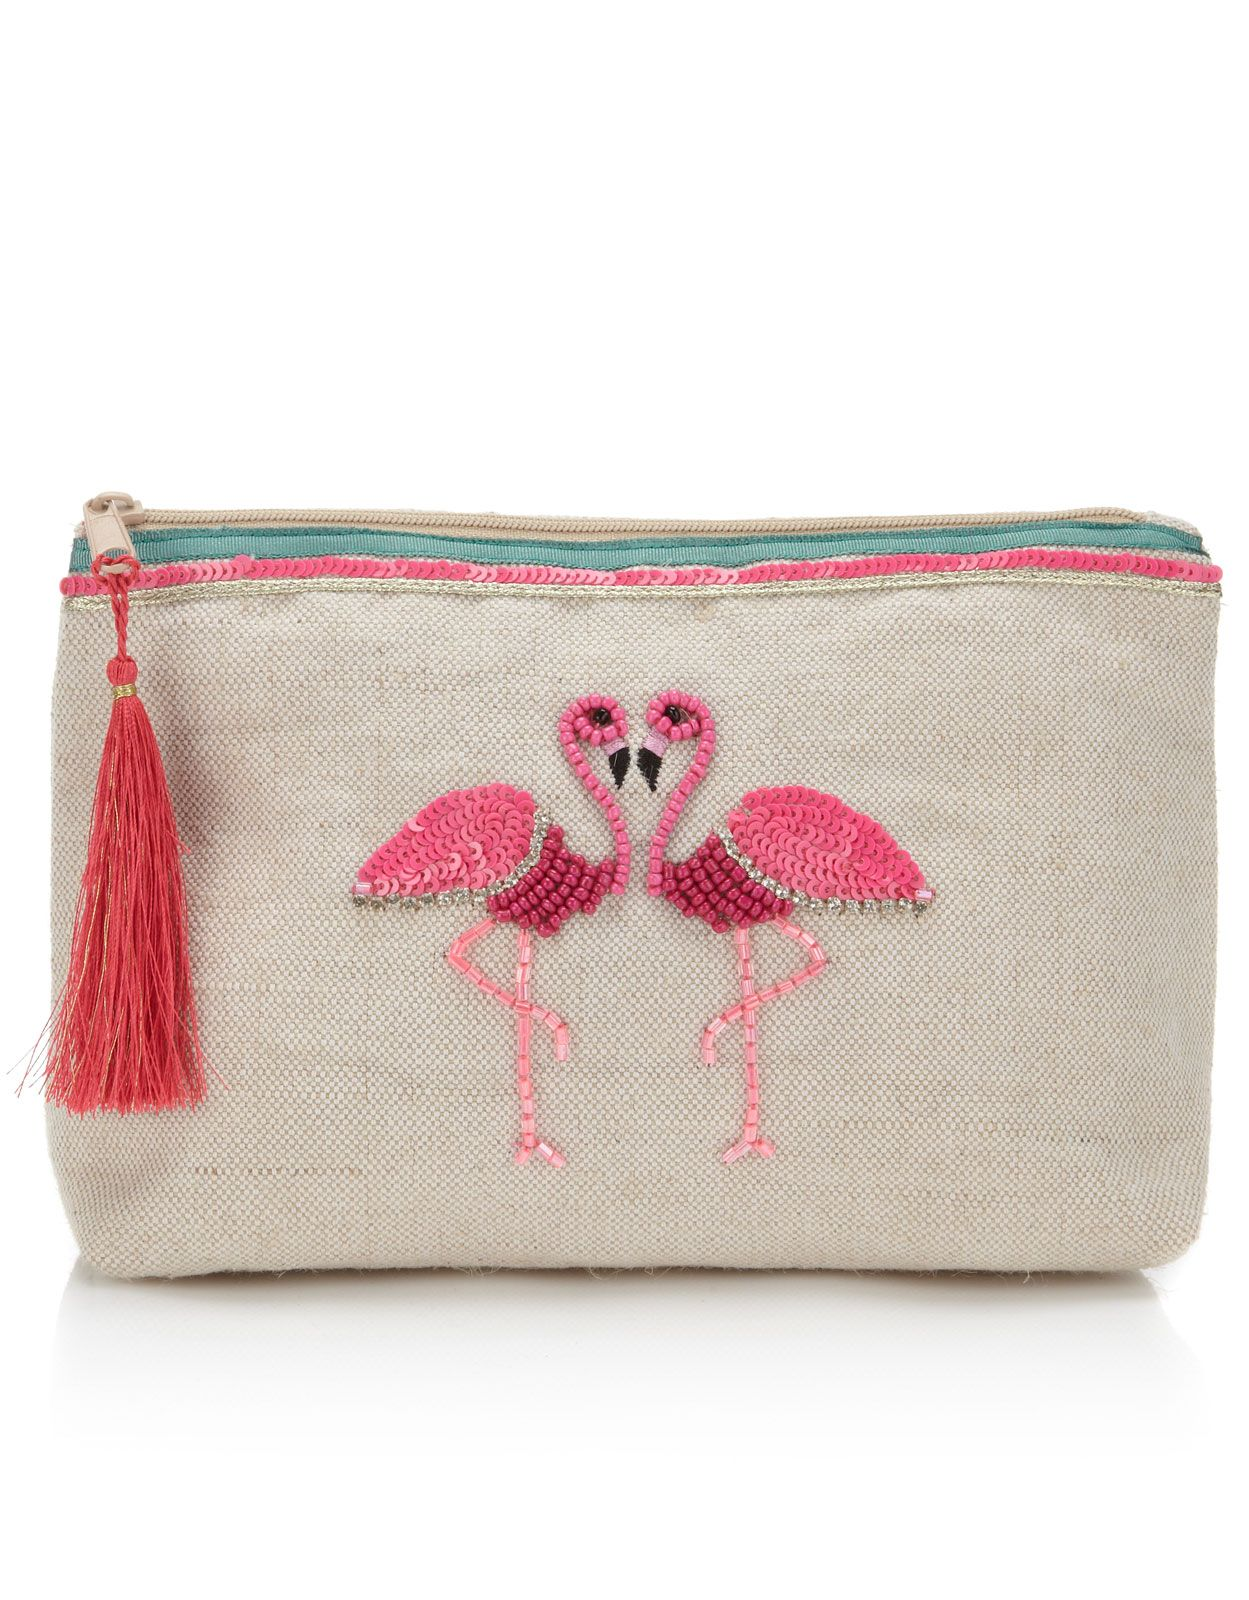 flamingo bag - Google Search Bolsa Diferentes 0a069f0170a1